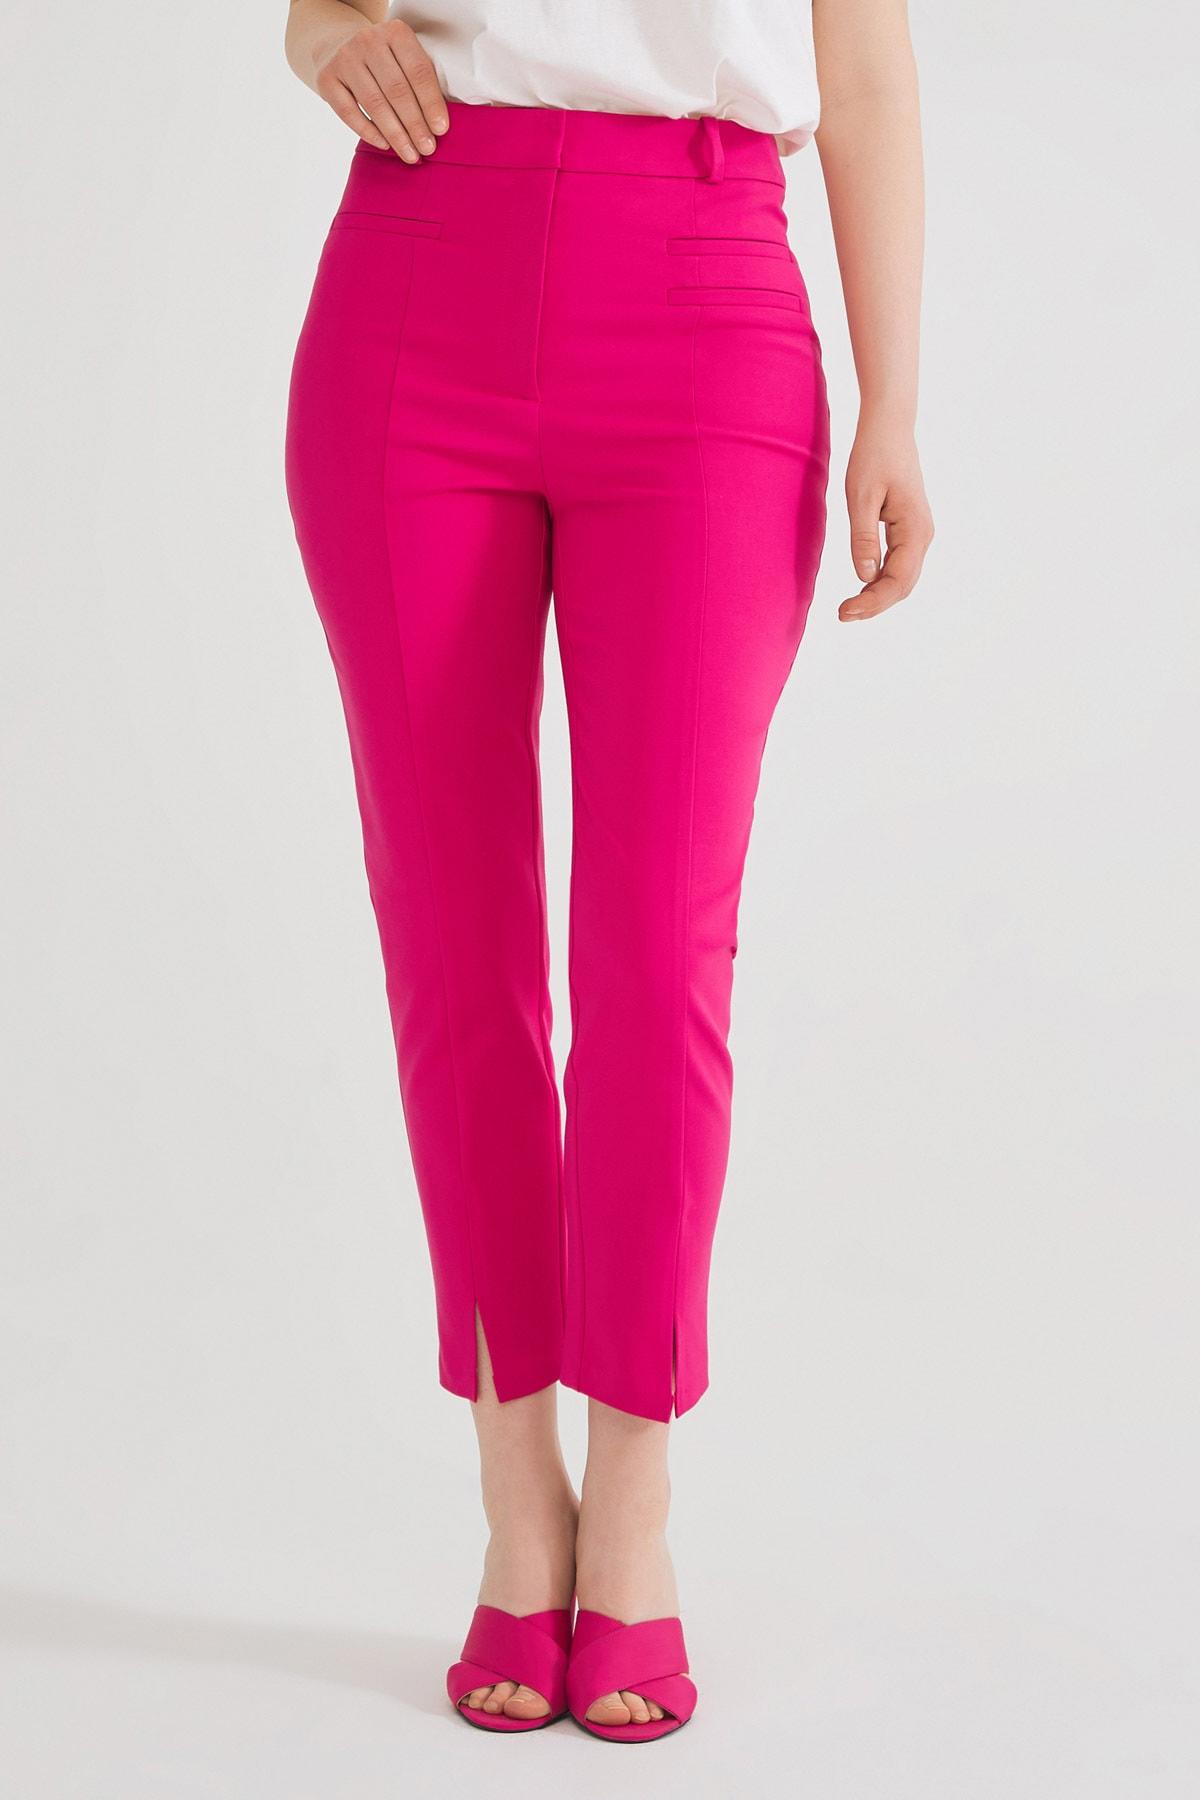 Love My Body Kadın Fusya Fleto Cepli Pantolon 2